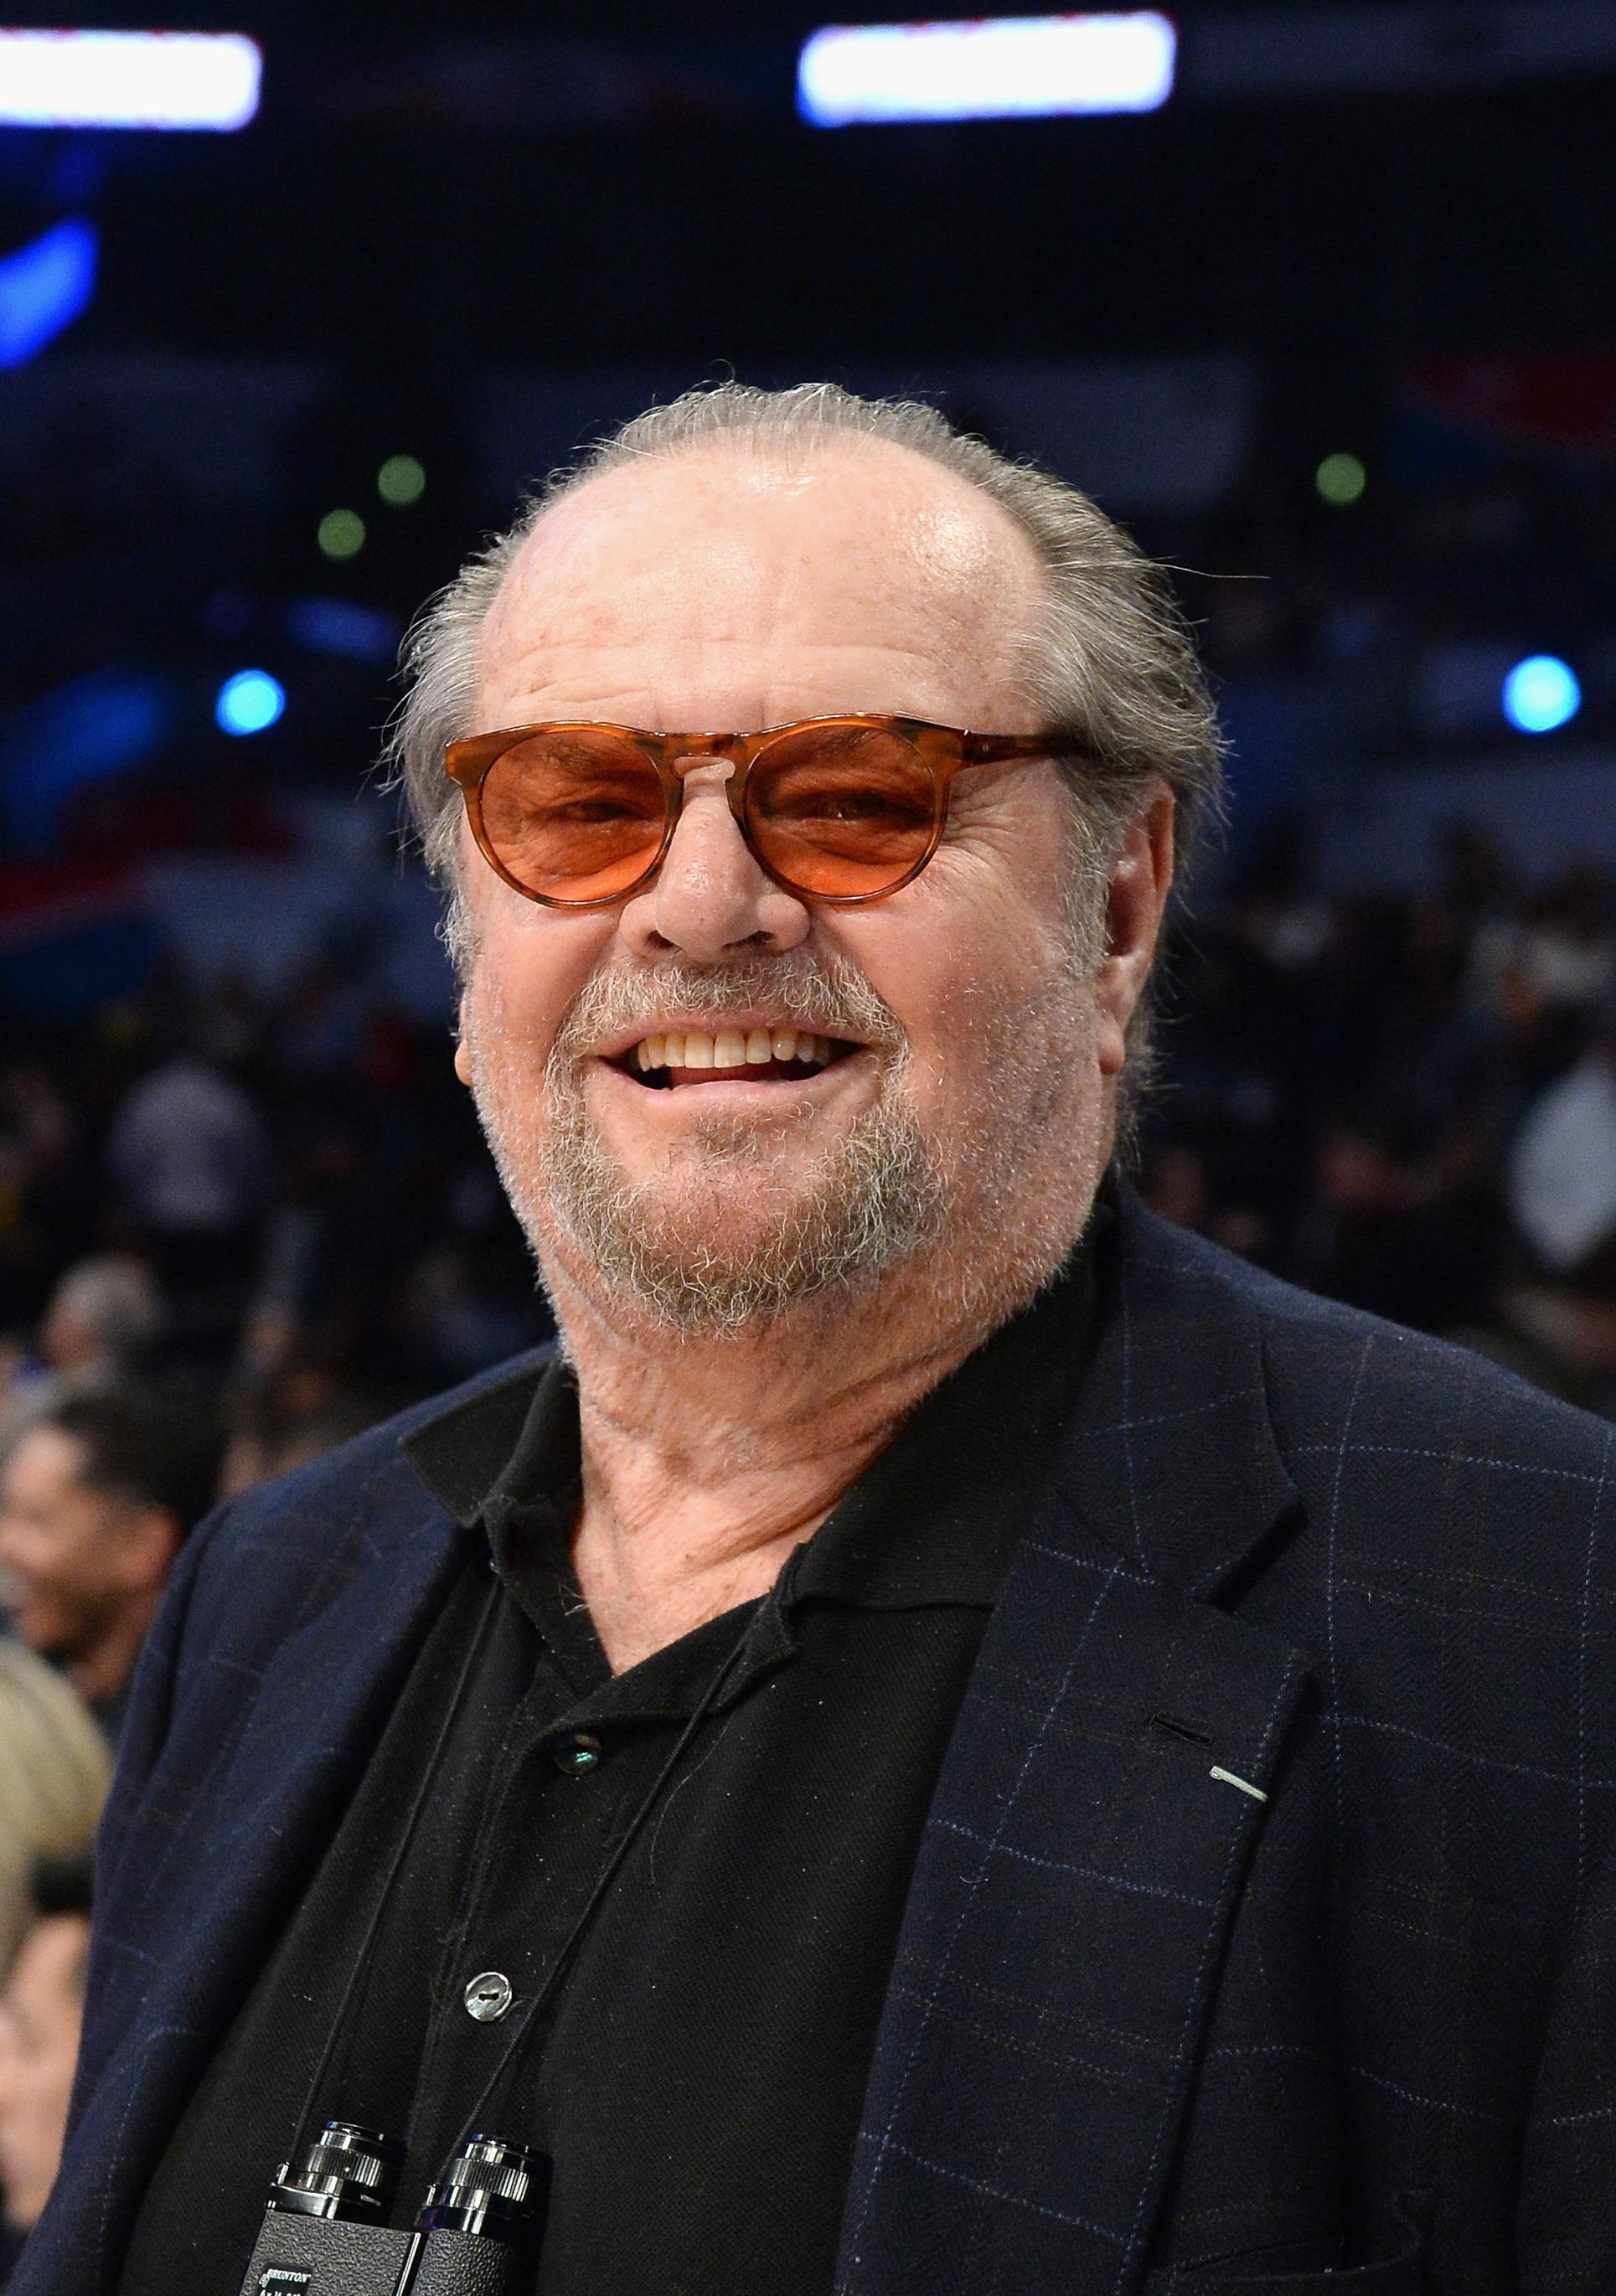 Duke เป็นหลานชายของ Jack Nicholson นักแสดงในตำนาน